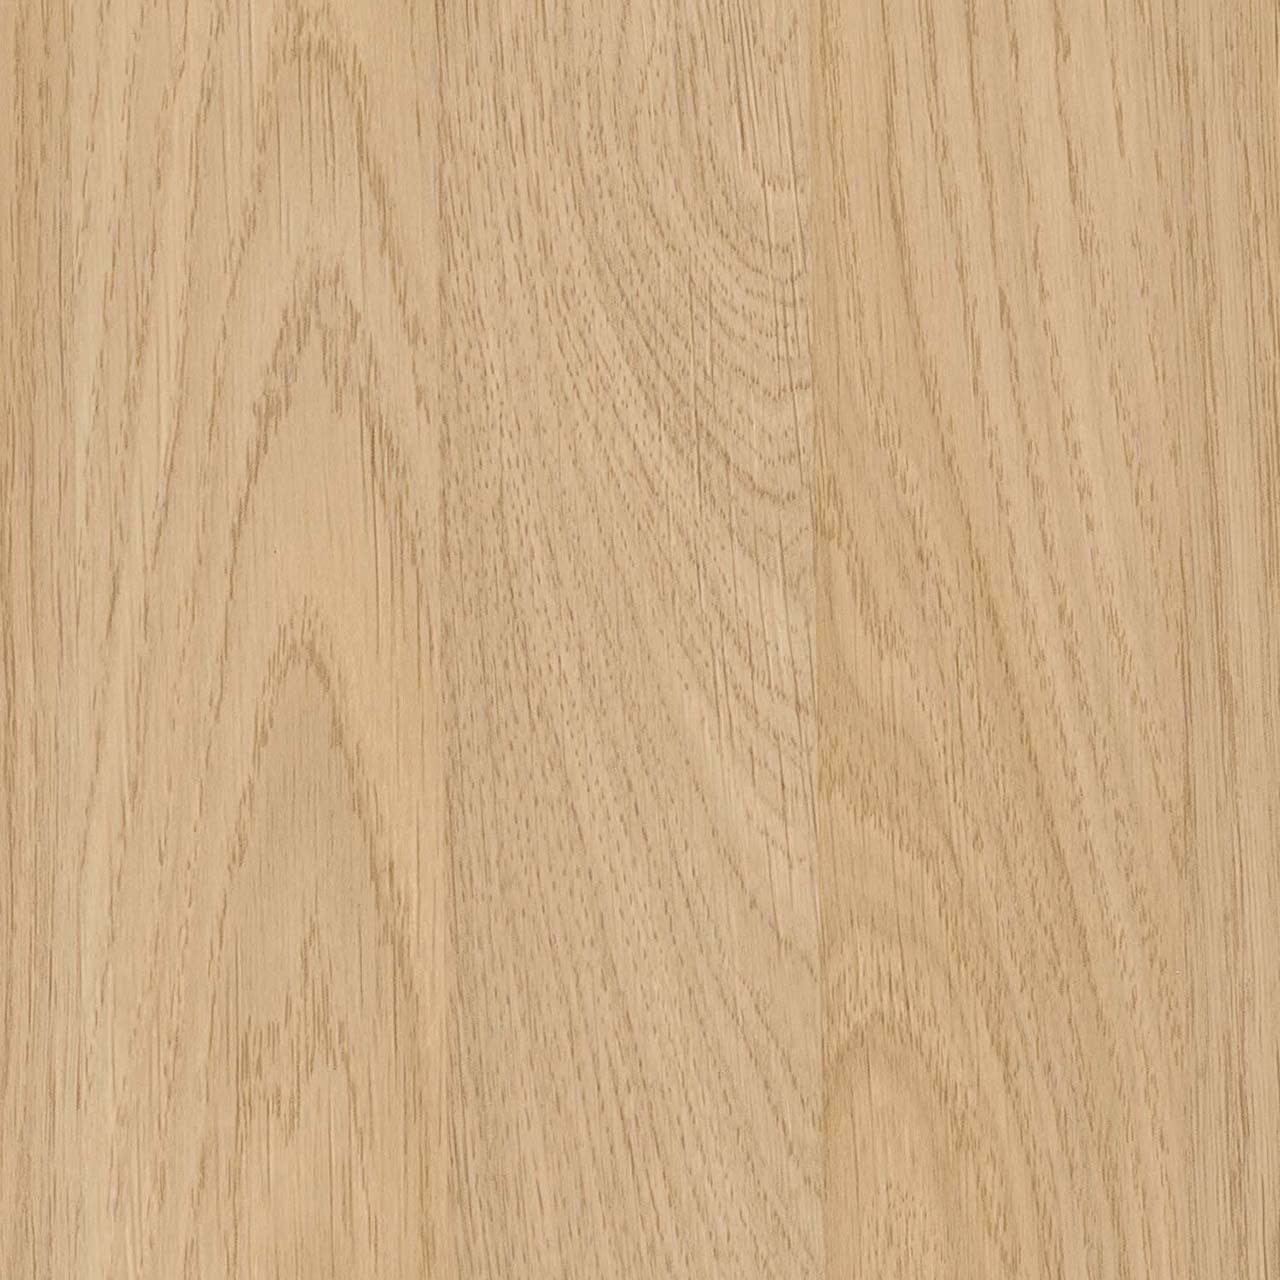 Montana Oak effect laminate panel